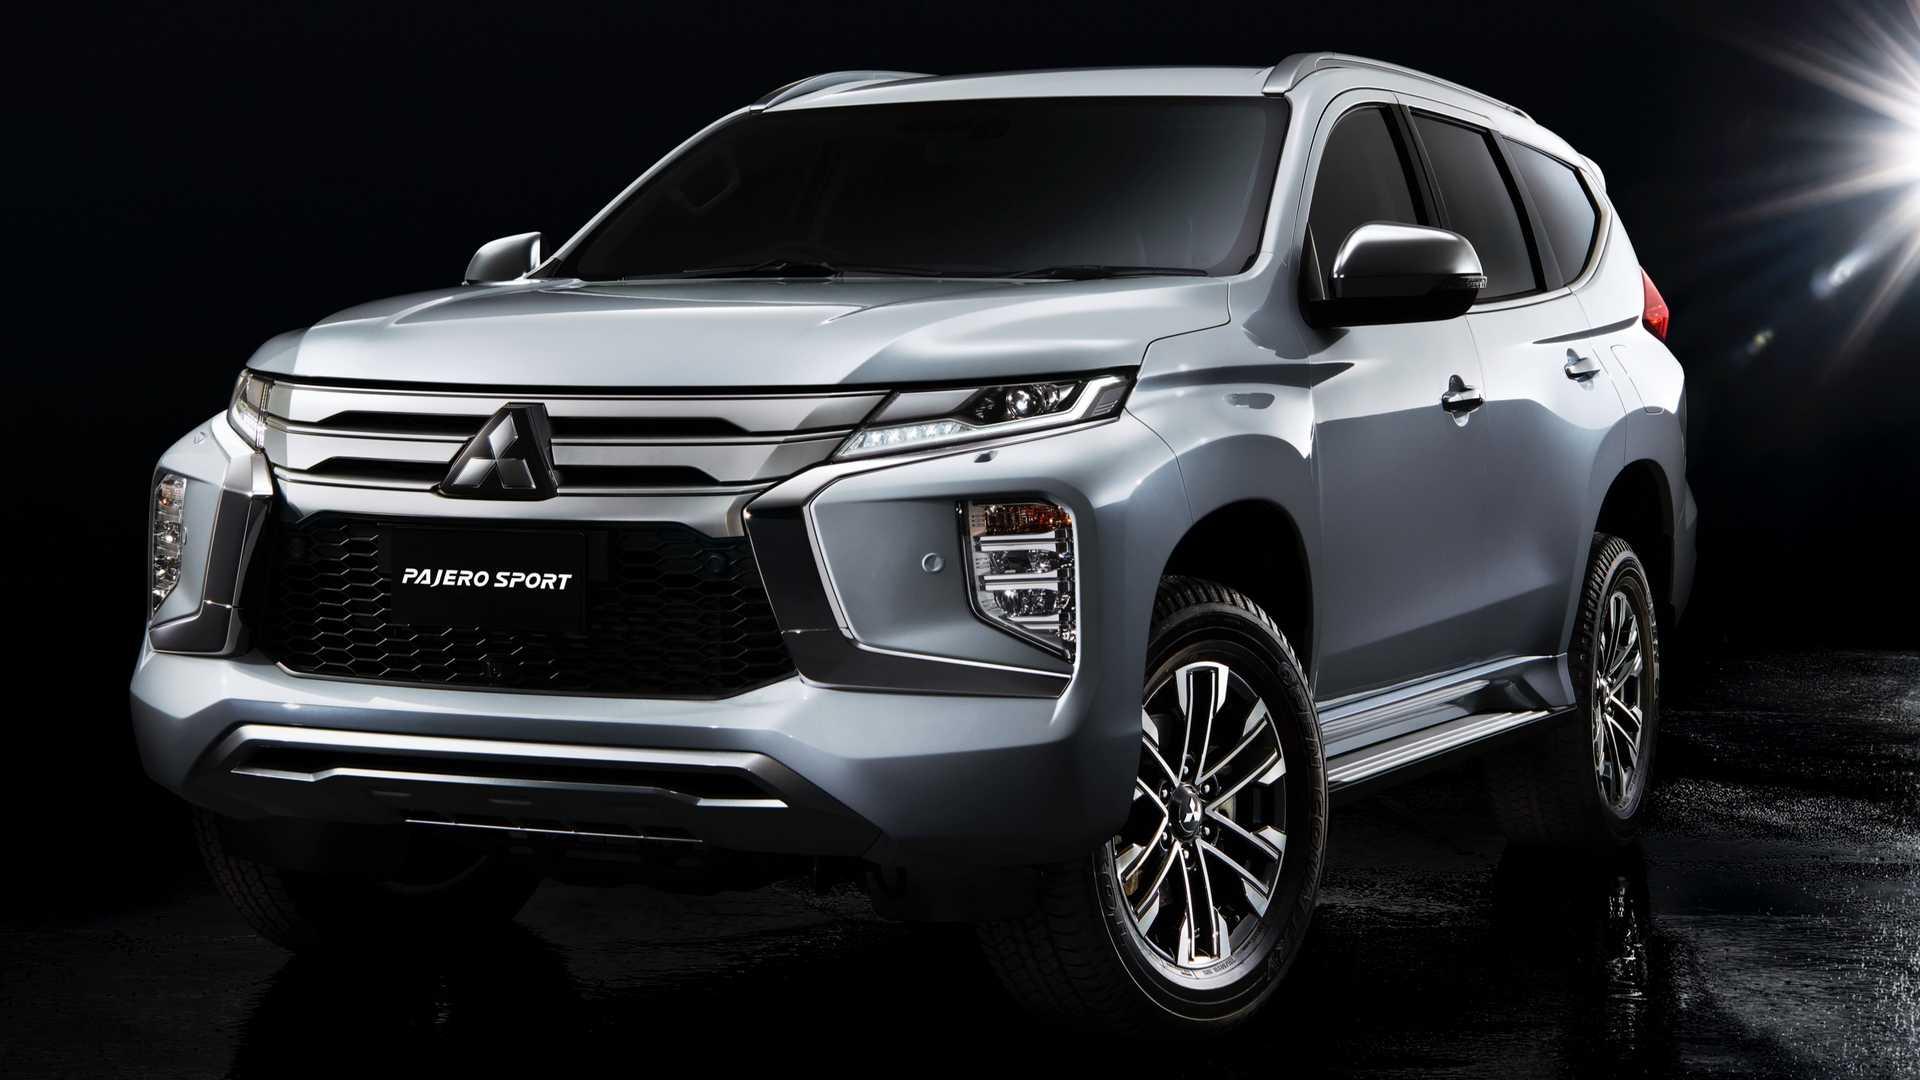 Mitsubishi Pajero Sport ganhou seu primeiro facelift na linha 2020 asiática